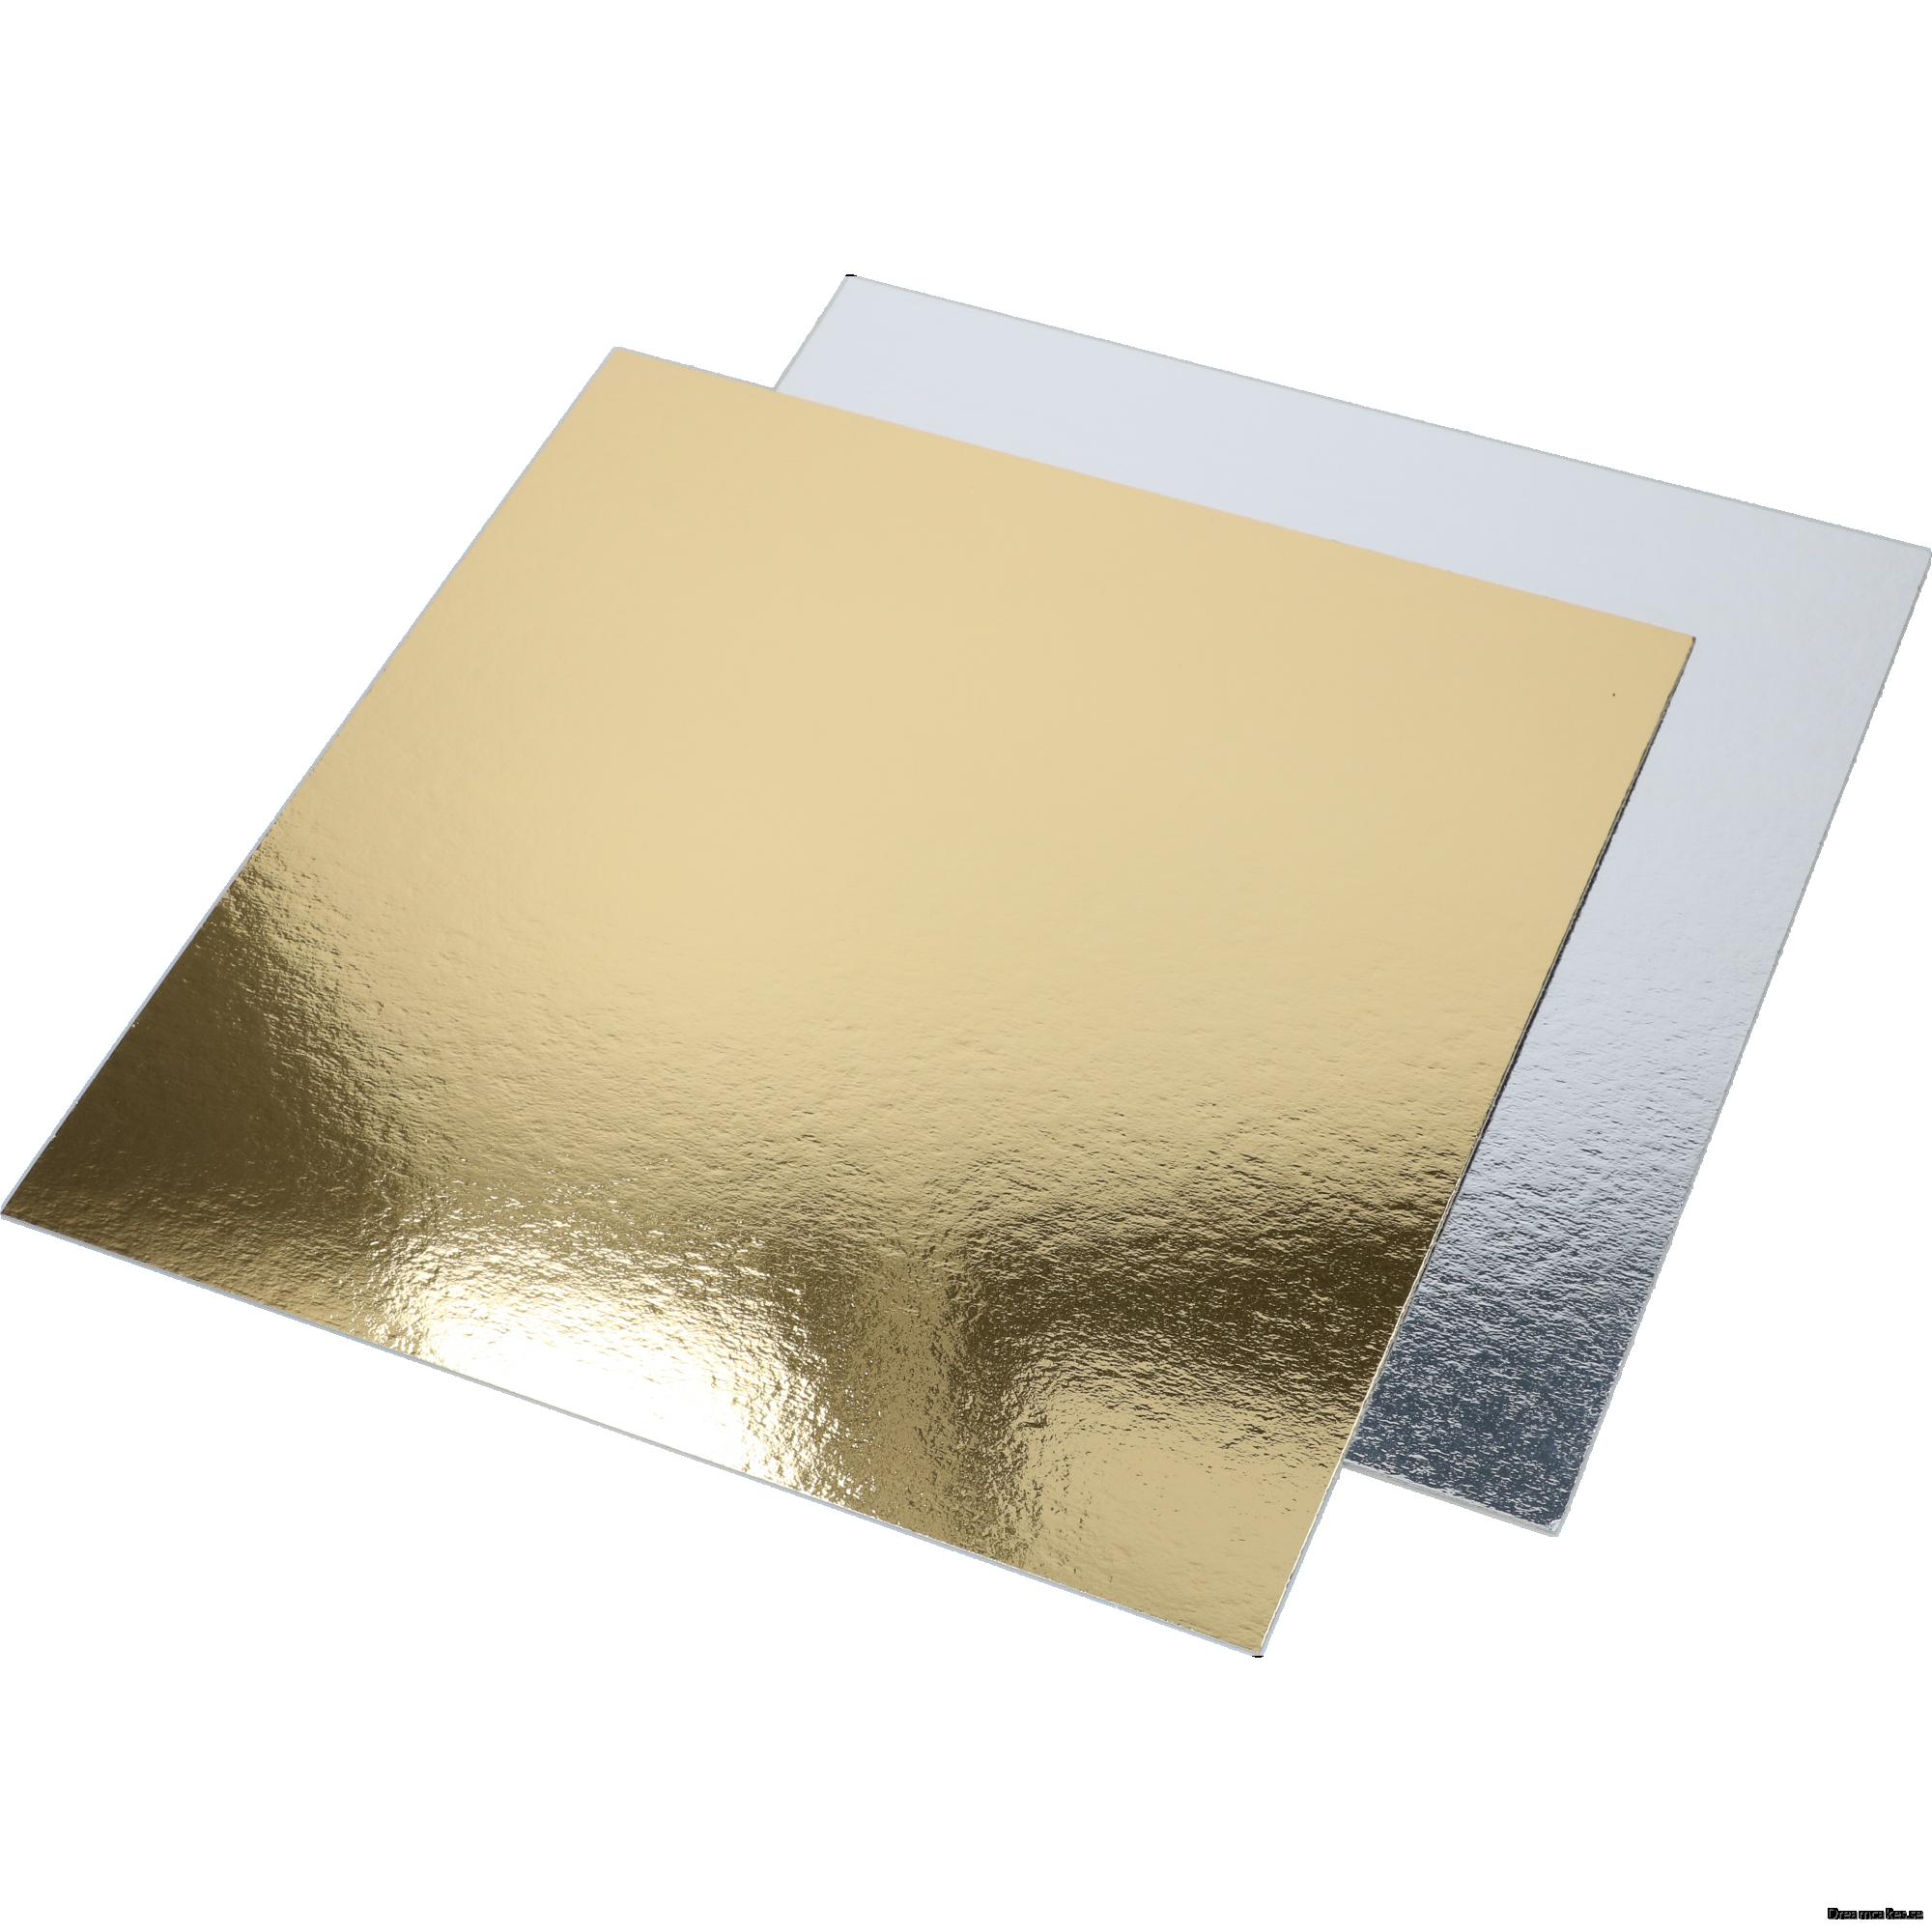 30x30 cm Guld/Silverbricka 10-pack